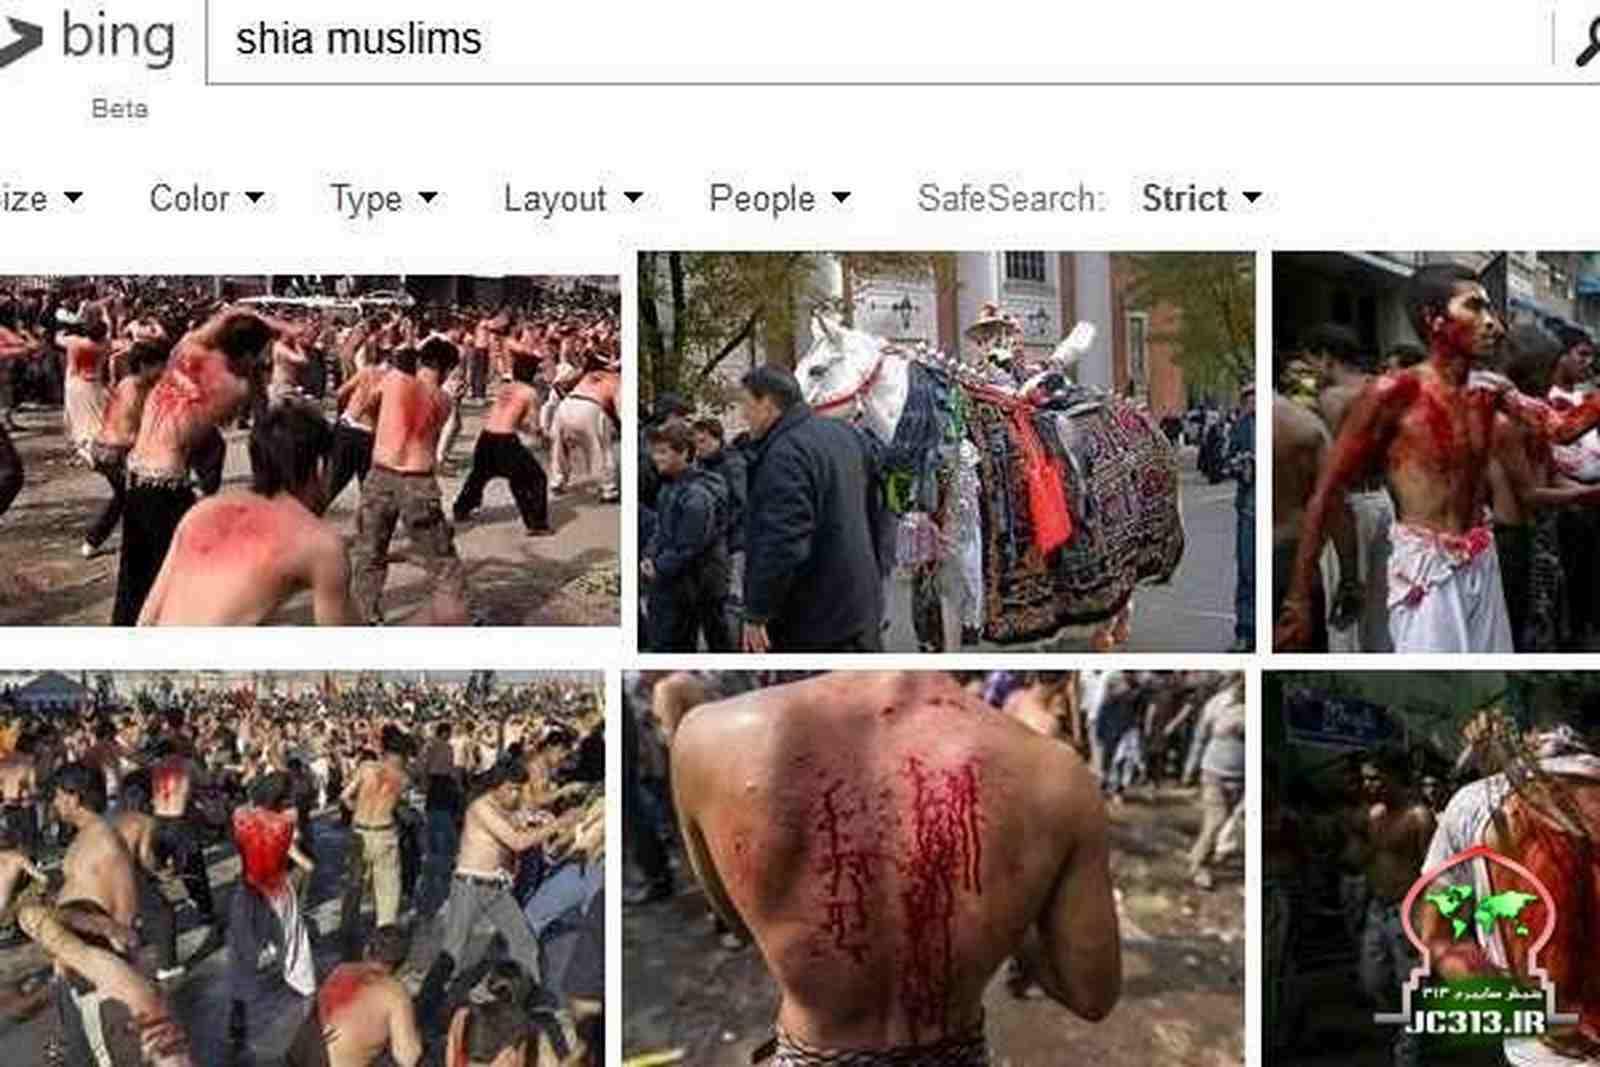 حقیقت سنی sunni muslims trueth